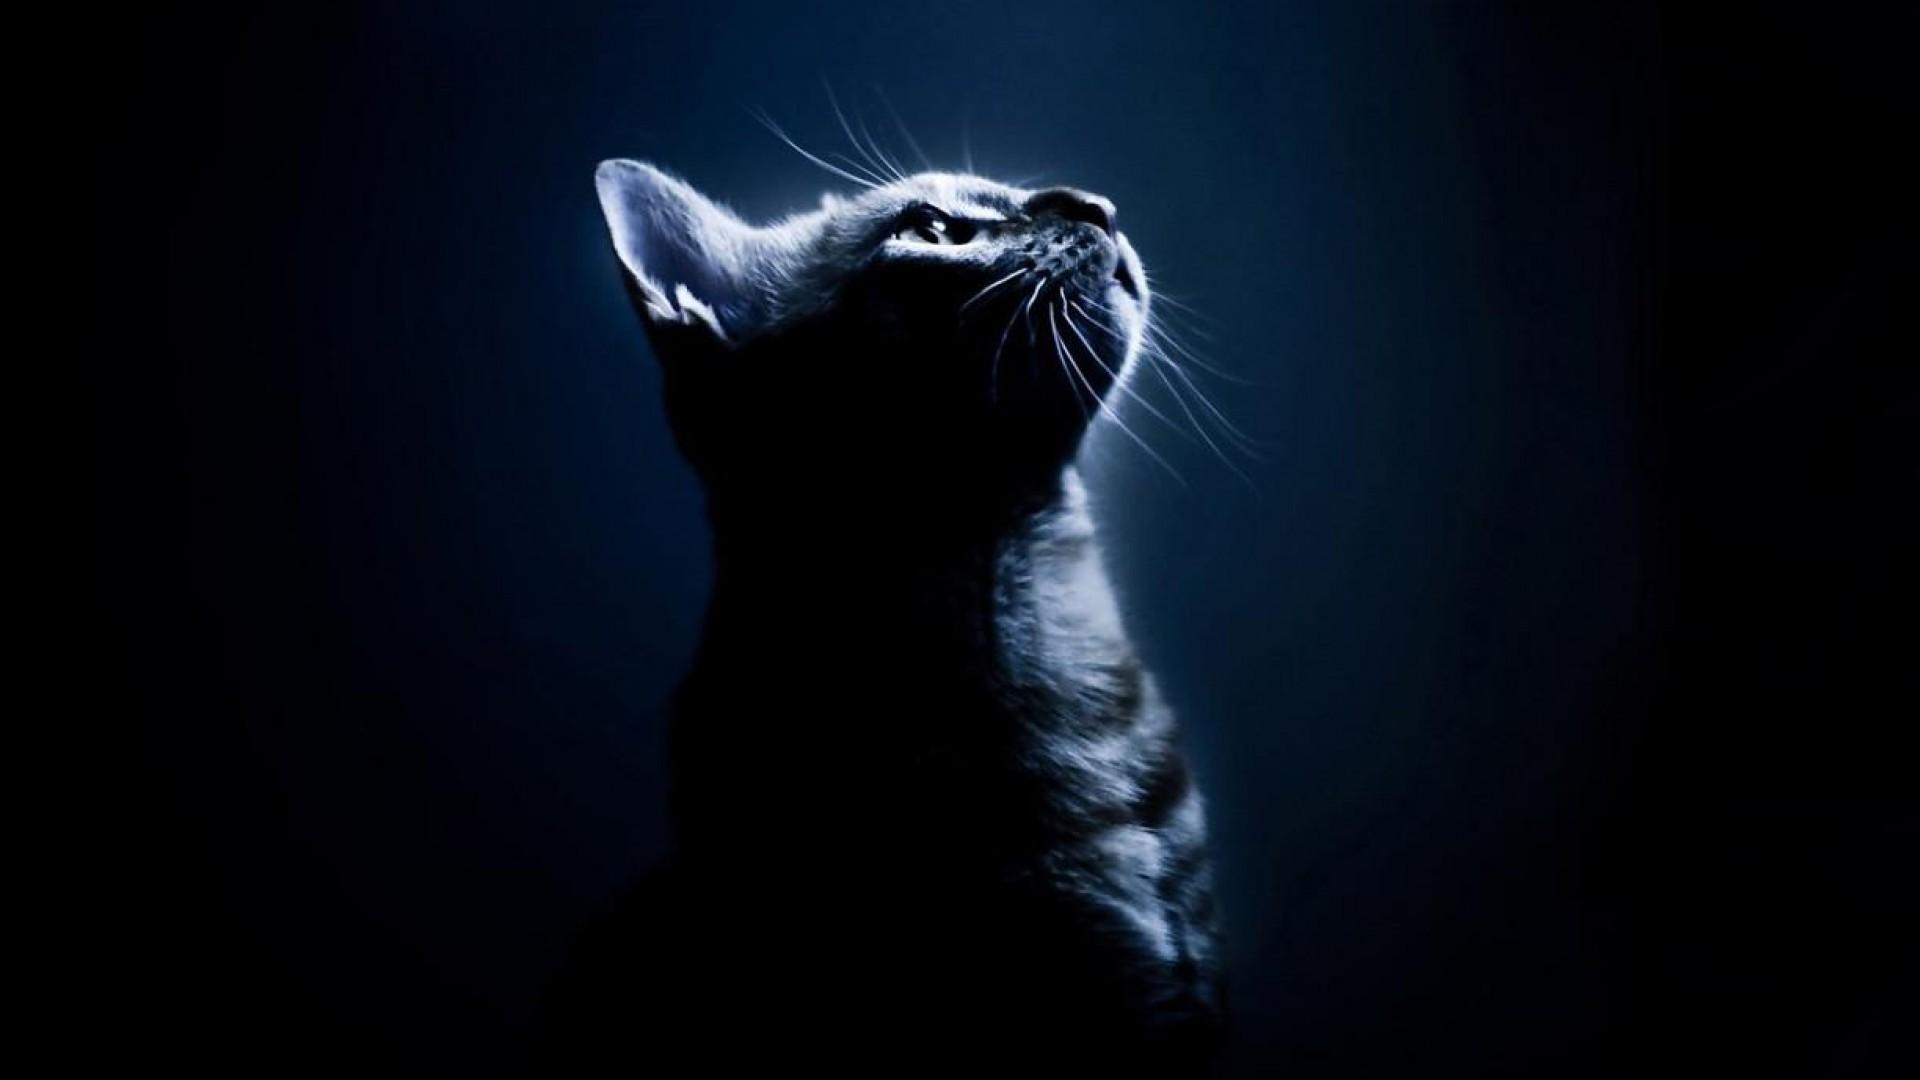 Black cat wallpaper download for desktop wallpaper